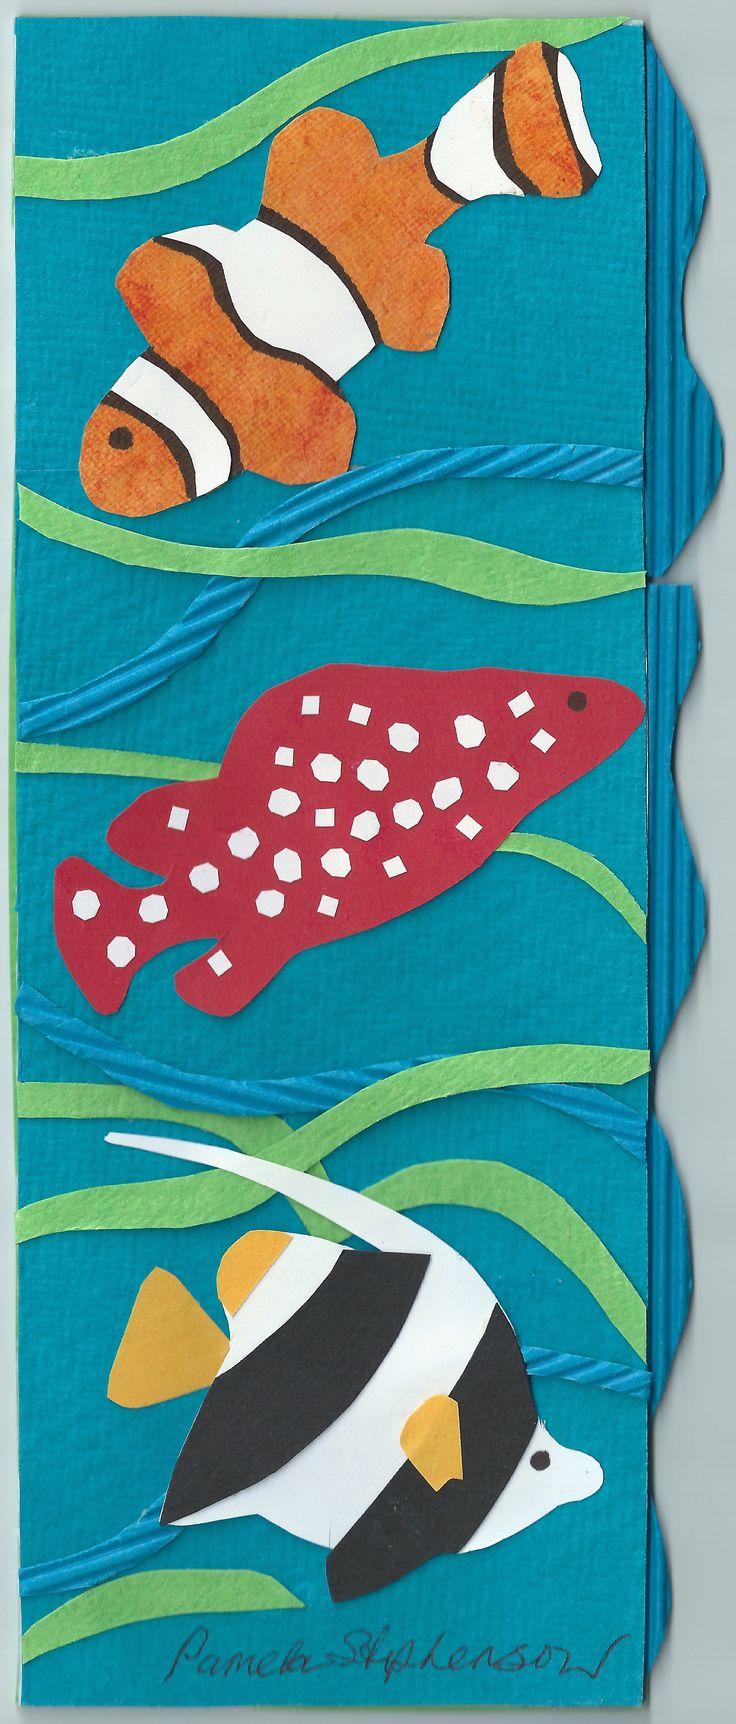 Pamela Stephenson Original. Collage on Card.